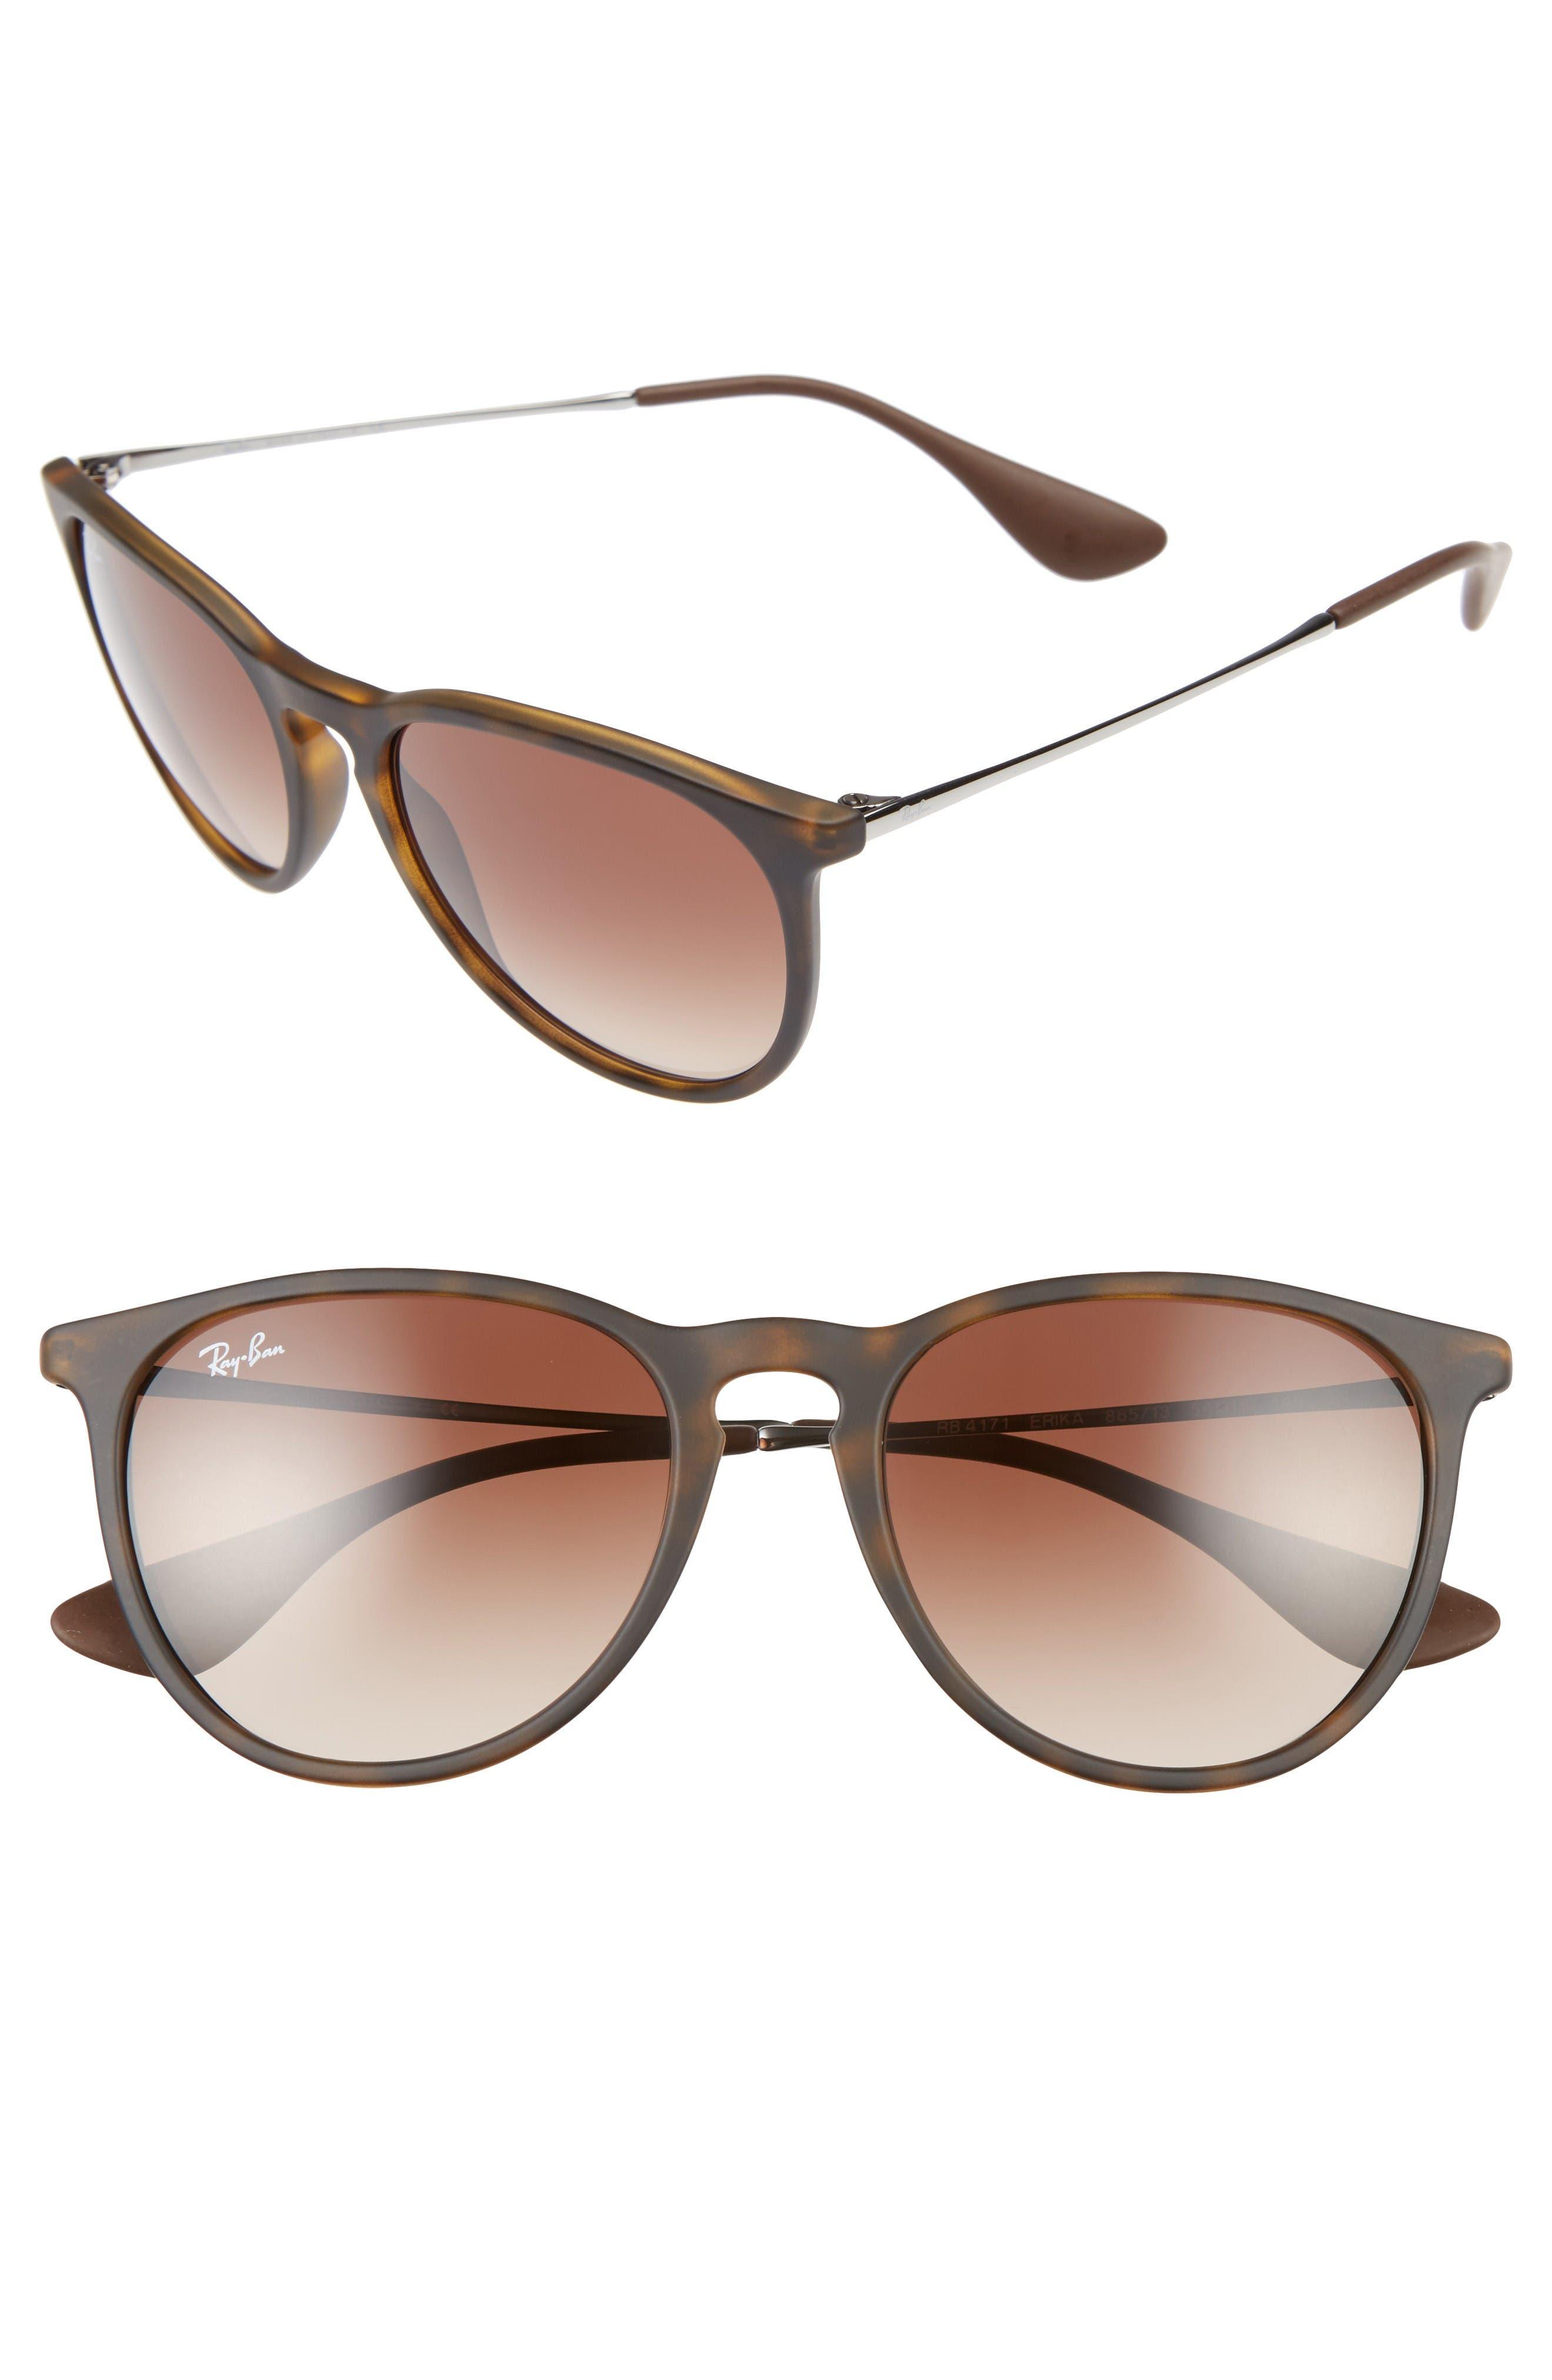 Erika Classic 54mm Sunglasses,                         Main,                         color, Havana/ Brown Gradient